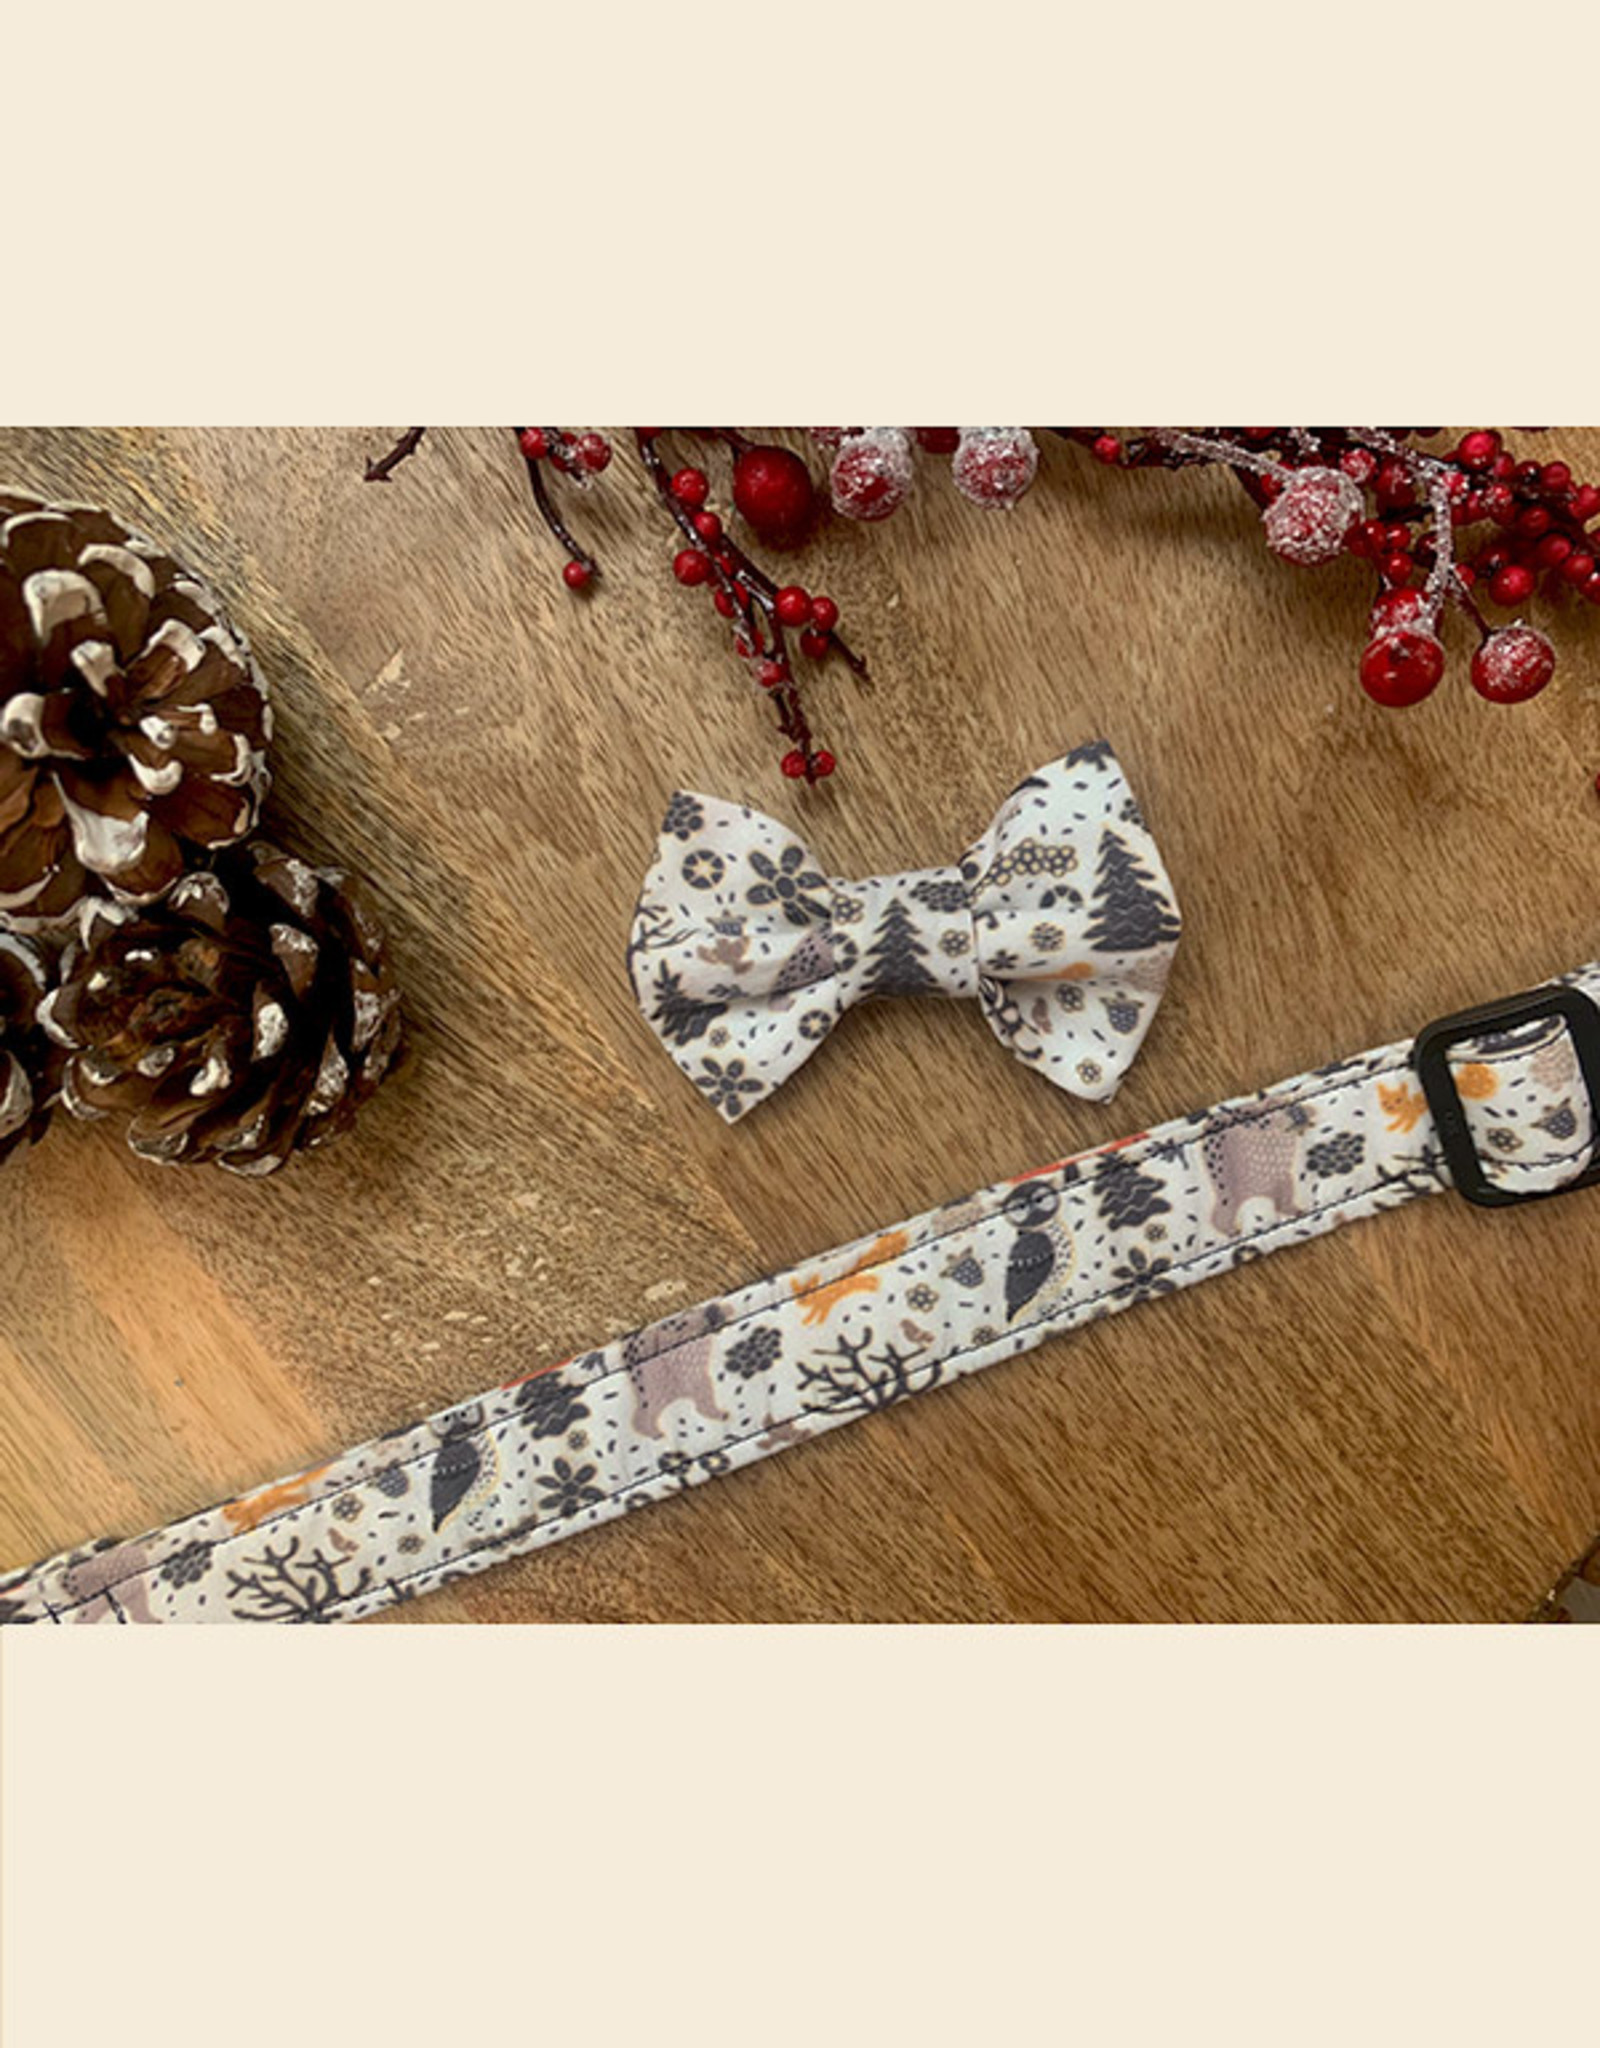 Halsband | Winter Wonderland - Laatste stuks!